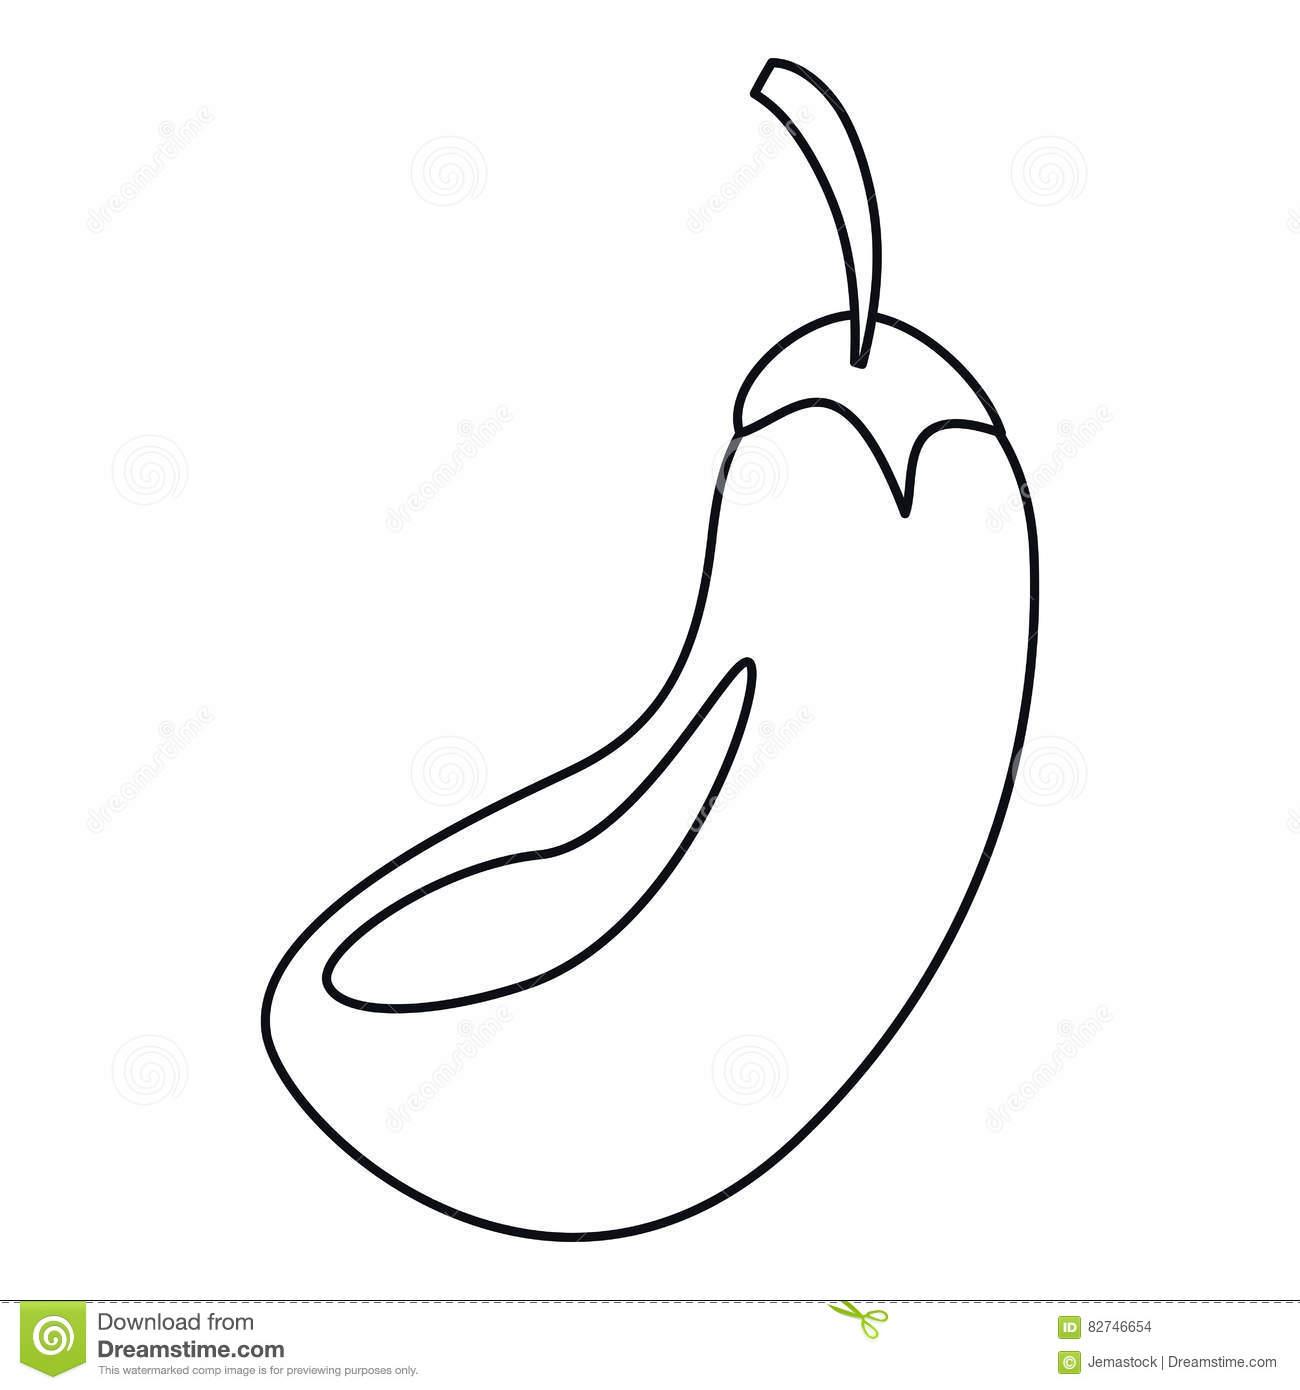 Eggplant Outline Clipart